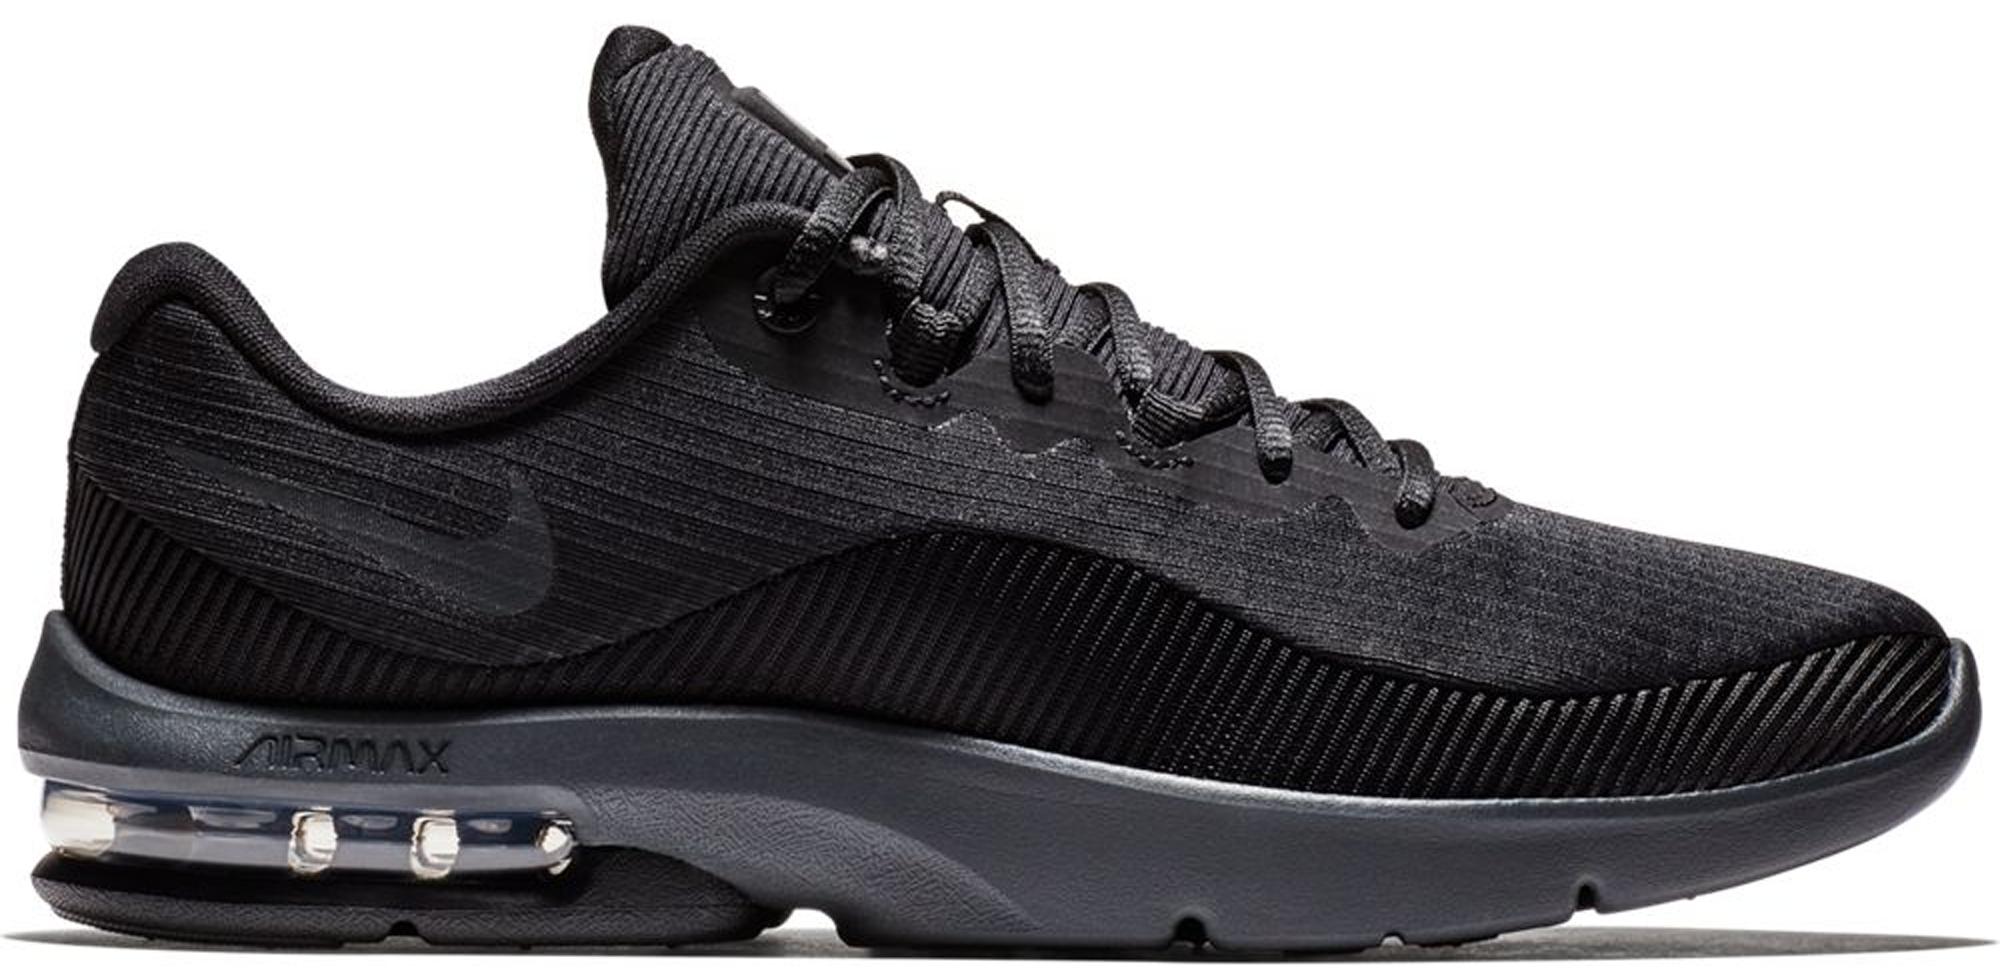 Nike Air Max Advantage 2 Black